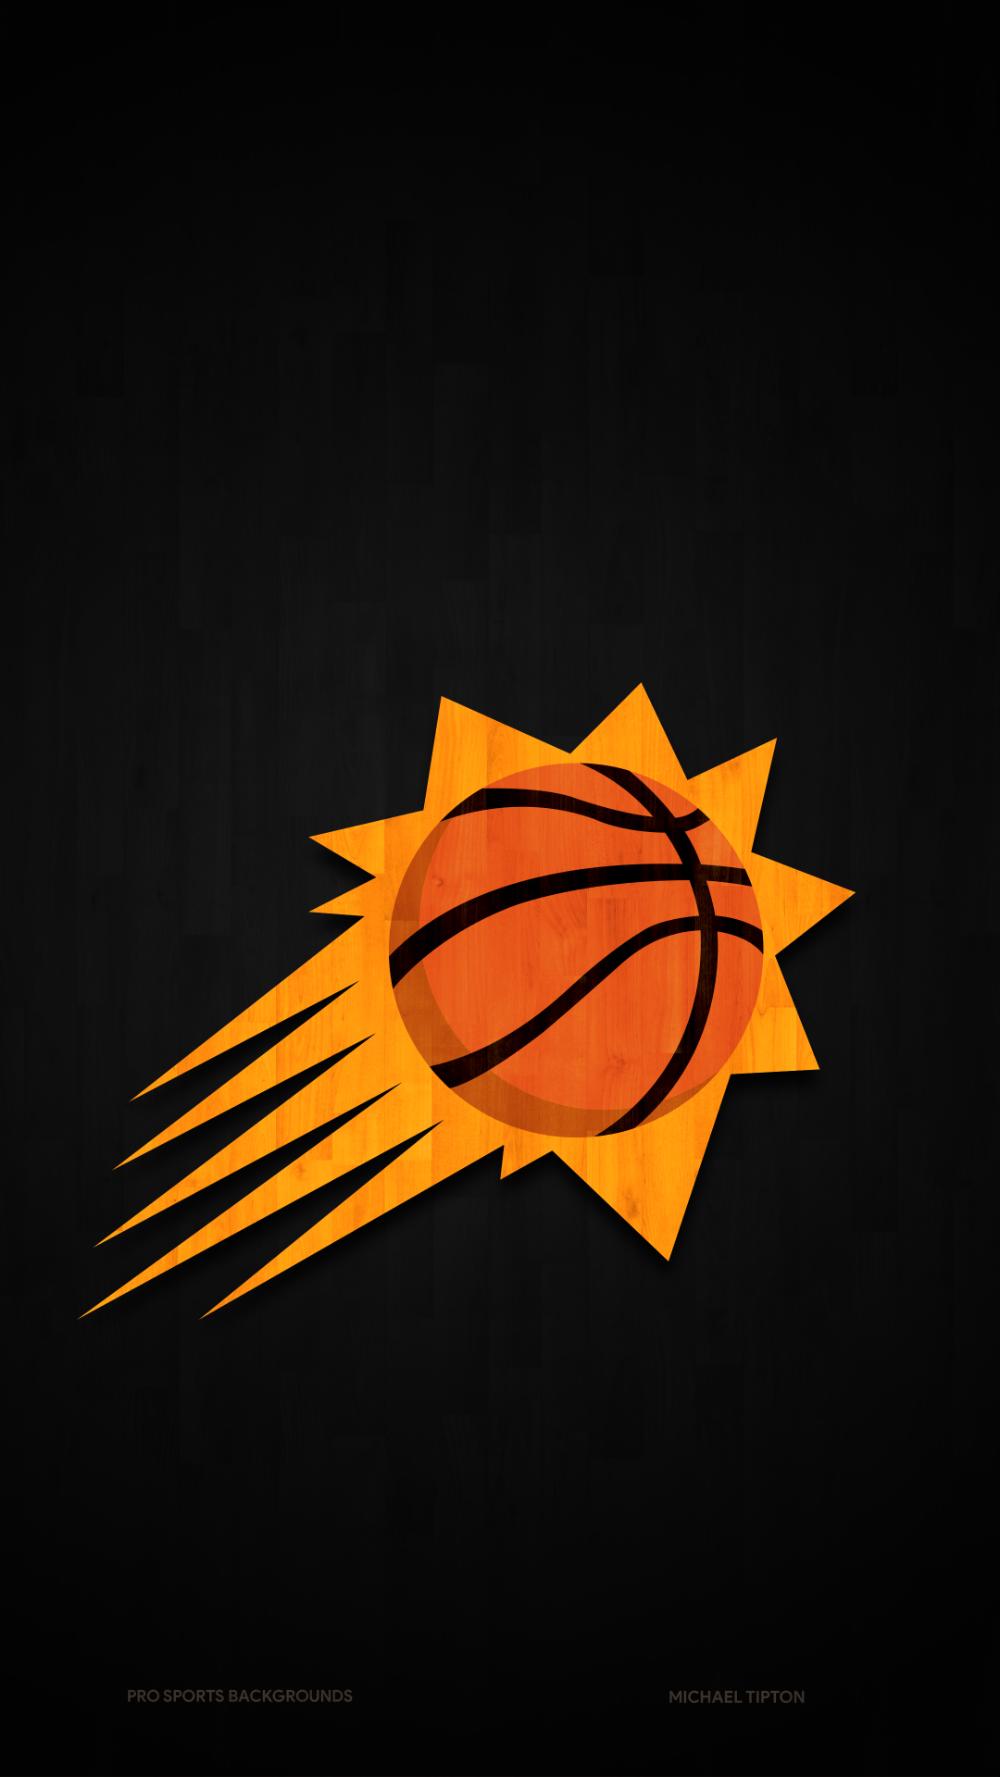 Phoenix Suns Wallpapers Pro Sports Backgrounds In 2021 Phoenix Suns Wallpaper Sun